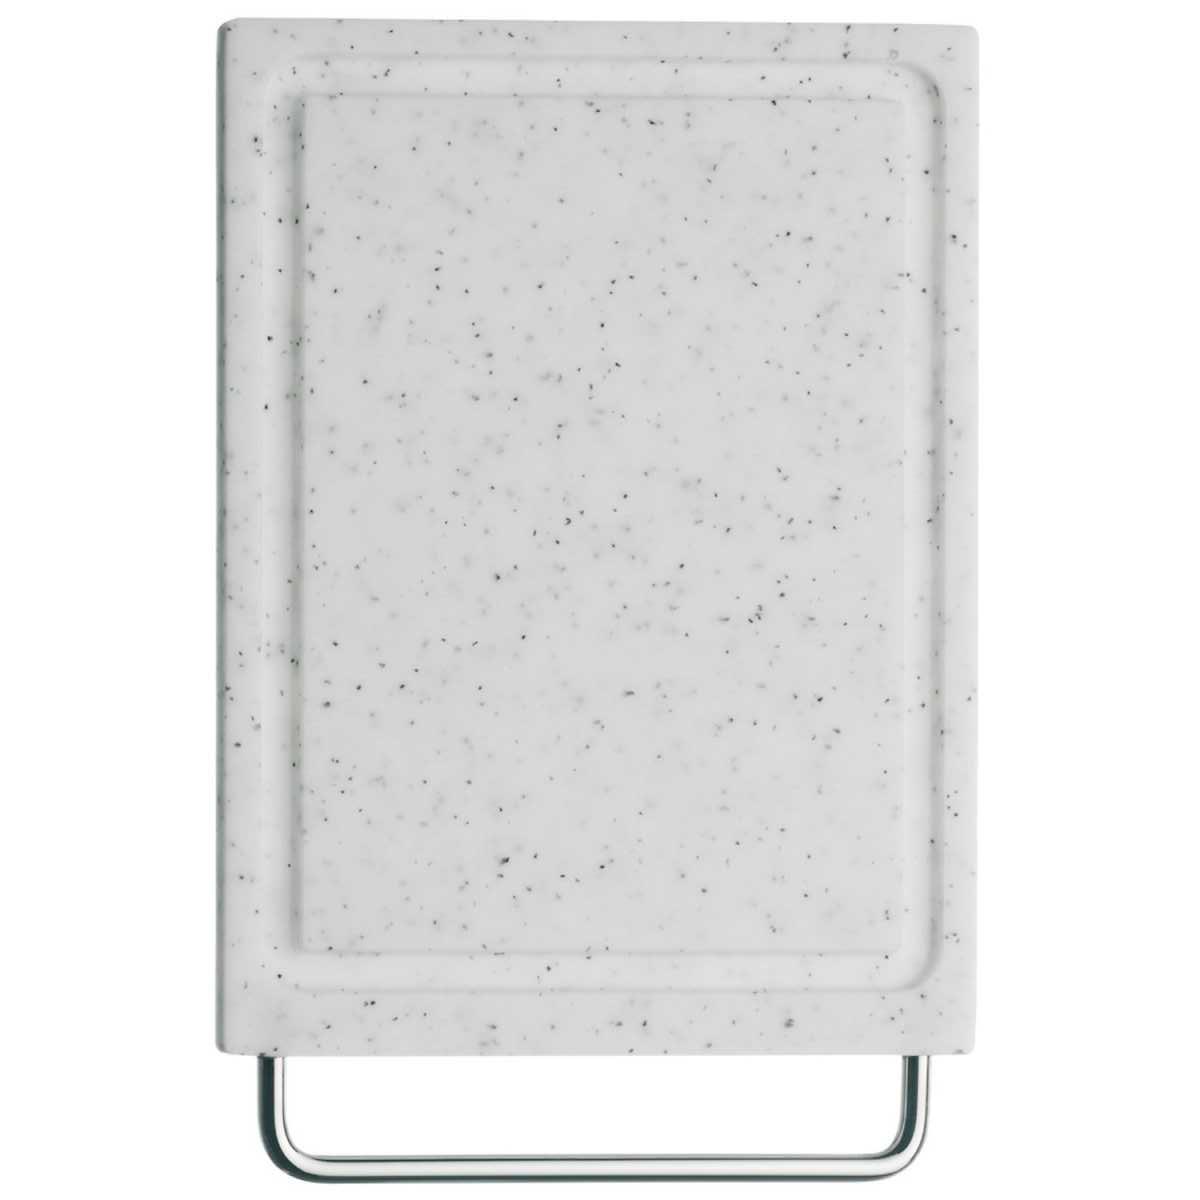 Доска разделочная WMF CHOPPING BOARDS, 27х20 см, серый WMF 18 7991 7470 фото 1